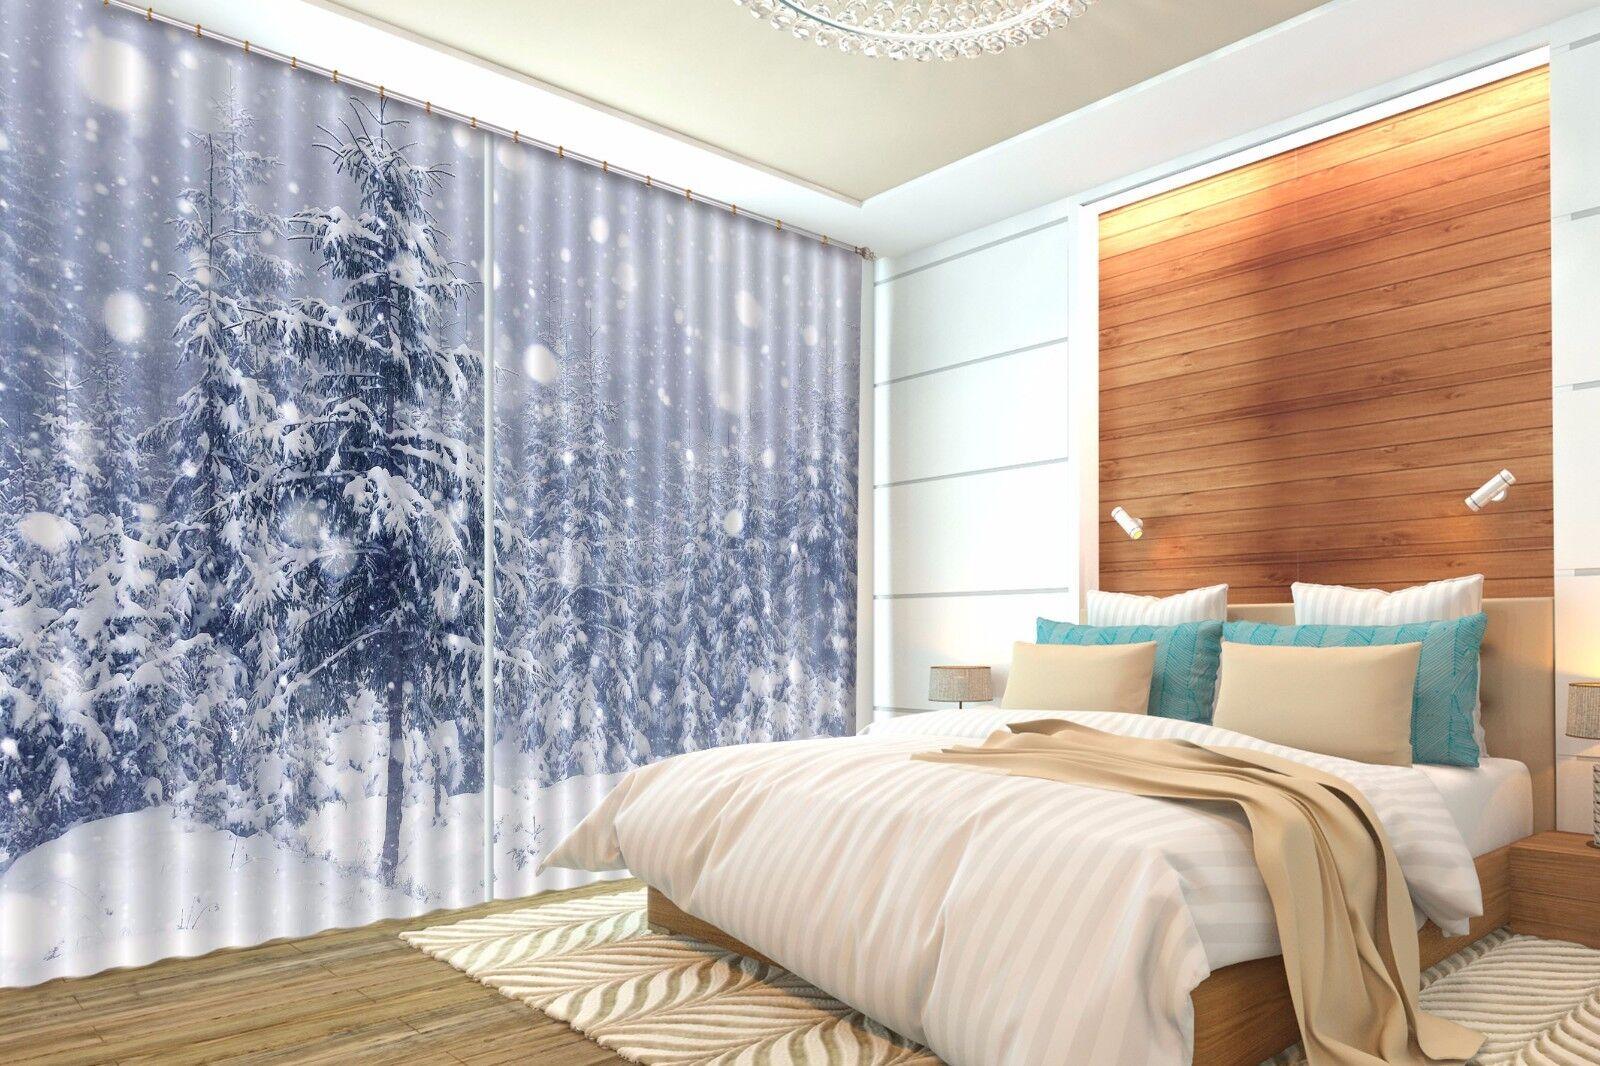 3D árbol de nieve 24 Cortinas de impresión de cortina de foto Blockout Tela Cortinas Ventana au